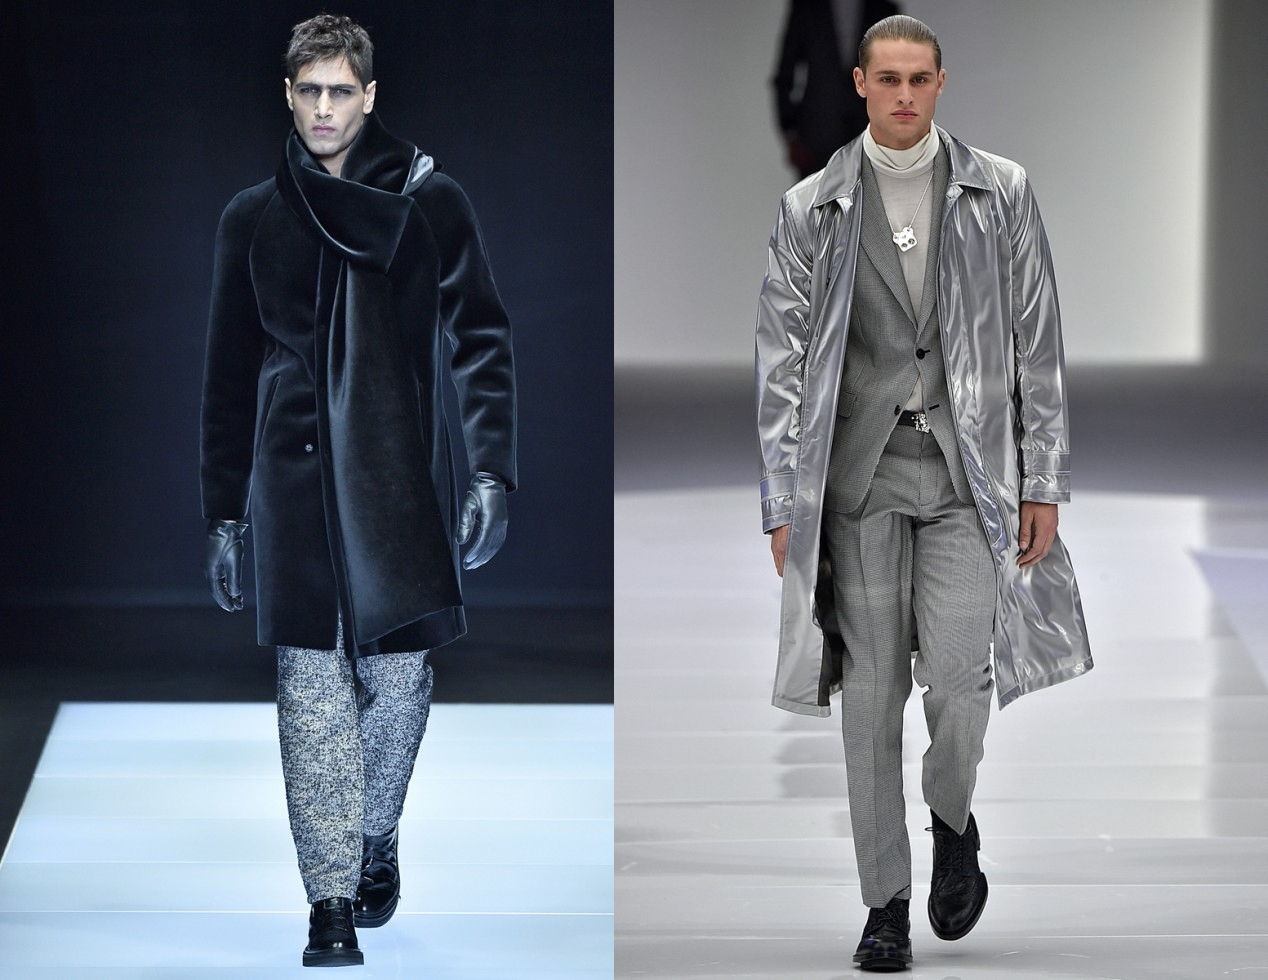 milan fashion week, review, trend, tendencia masculina, moda masculina, style, estilo, alex cursino, moda sem censura, blogger, fashion blogger, blog, menswear, social media, digital influencer, 3